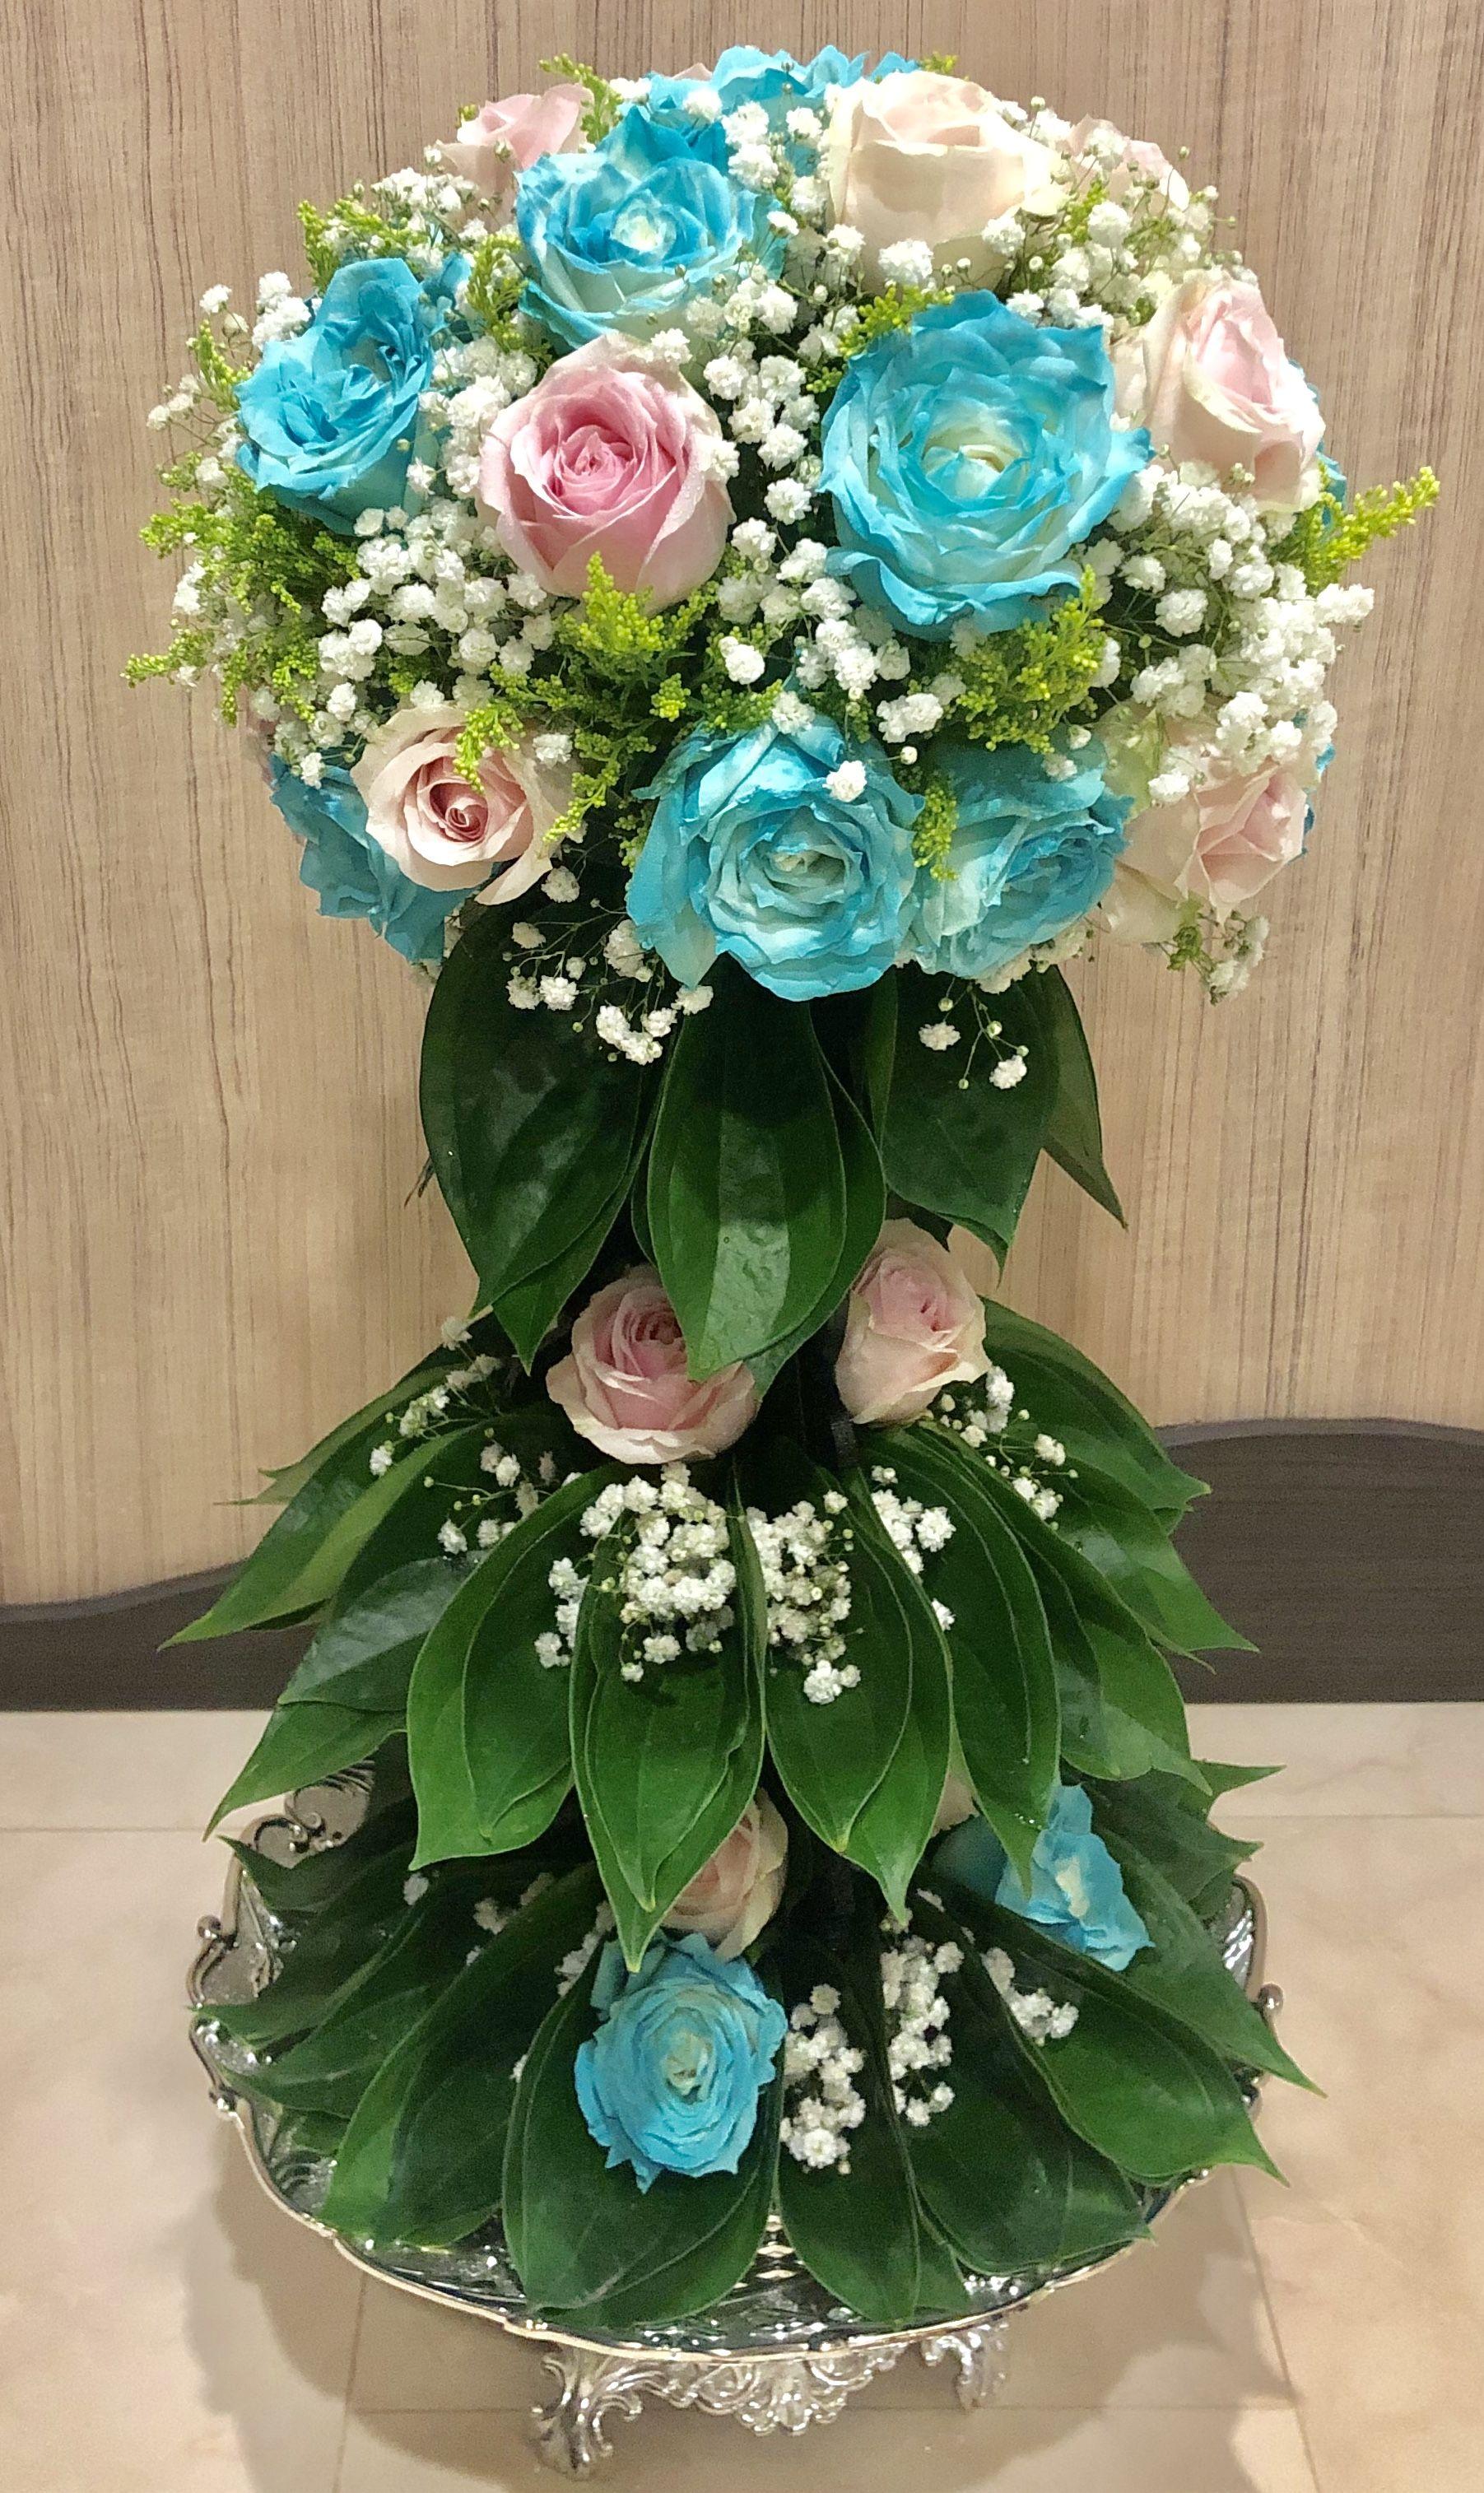 Pin by Aana Isaana on sireh junjung Wedding gifts